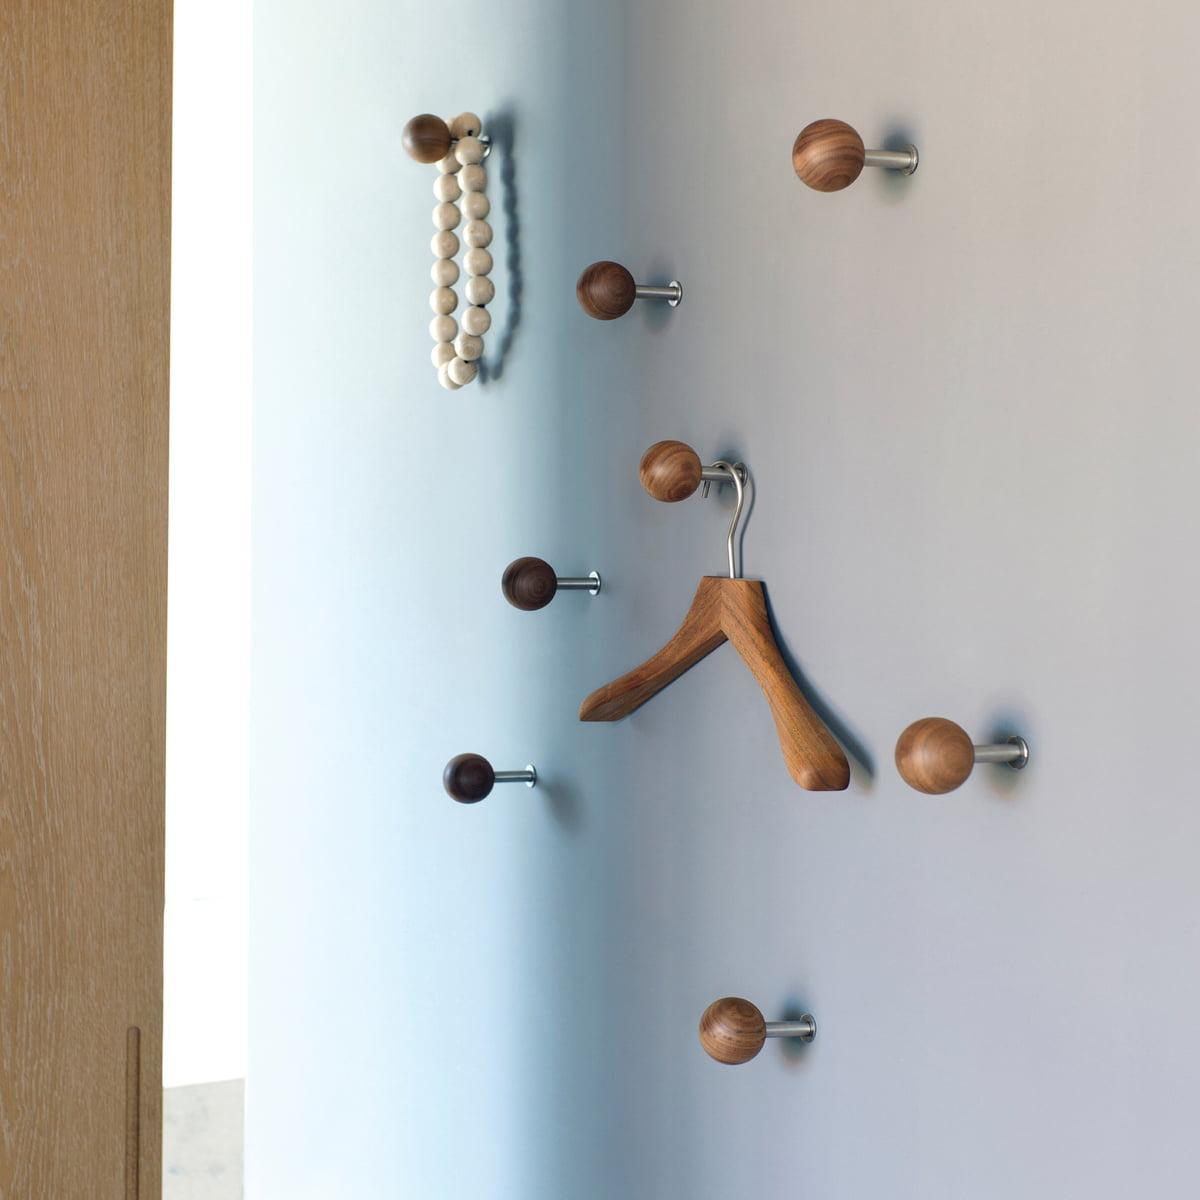 Dots wandhaken sch nbuch for Garderobe dots